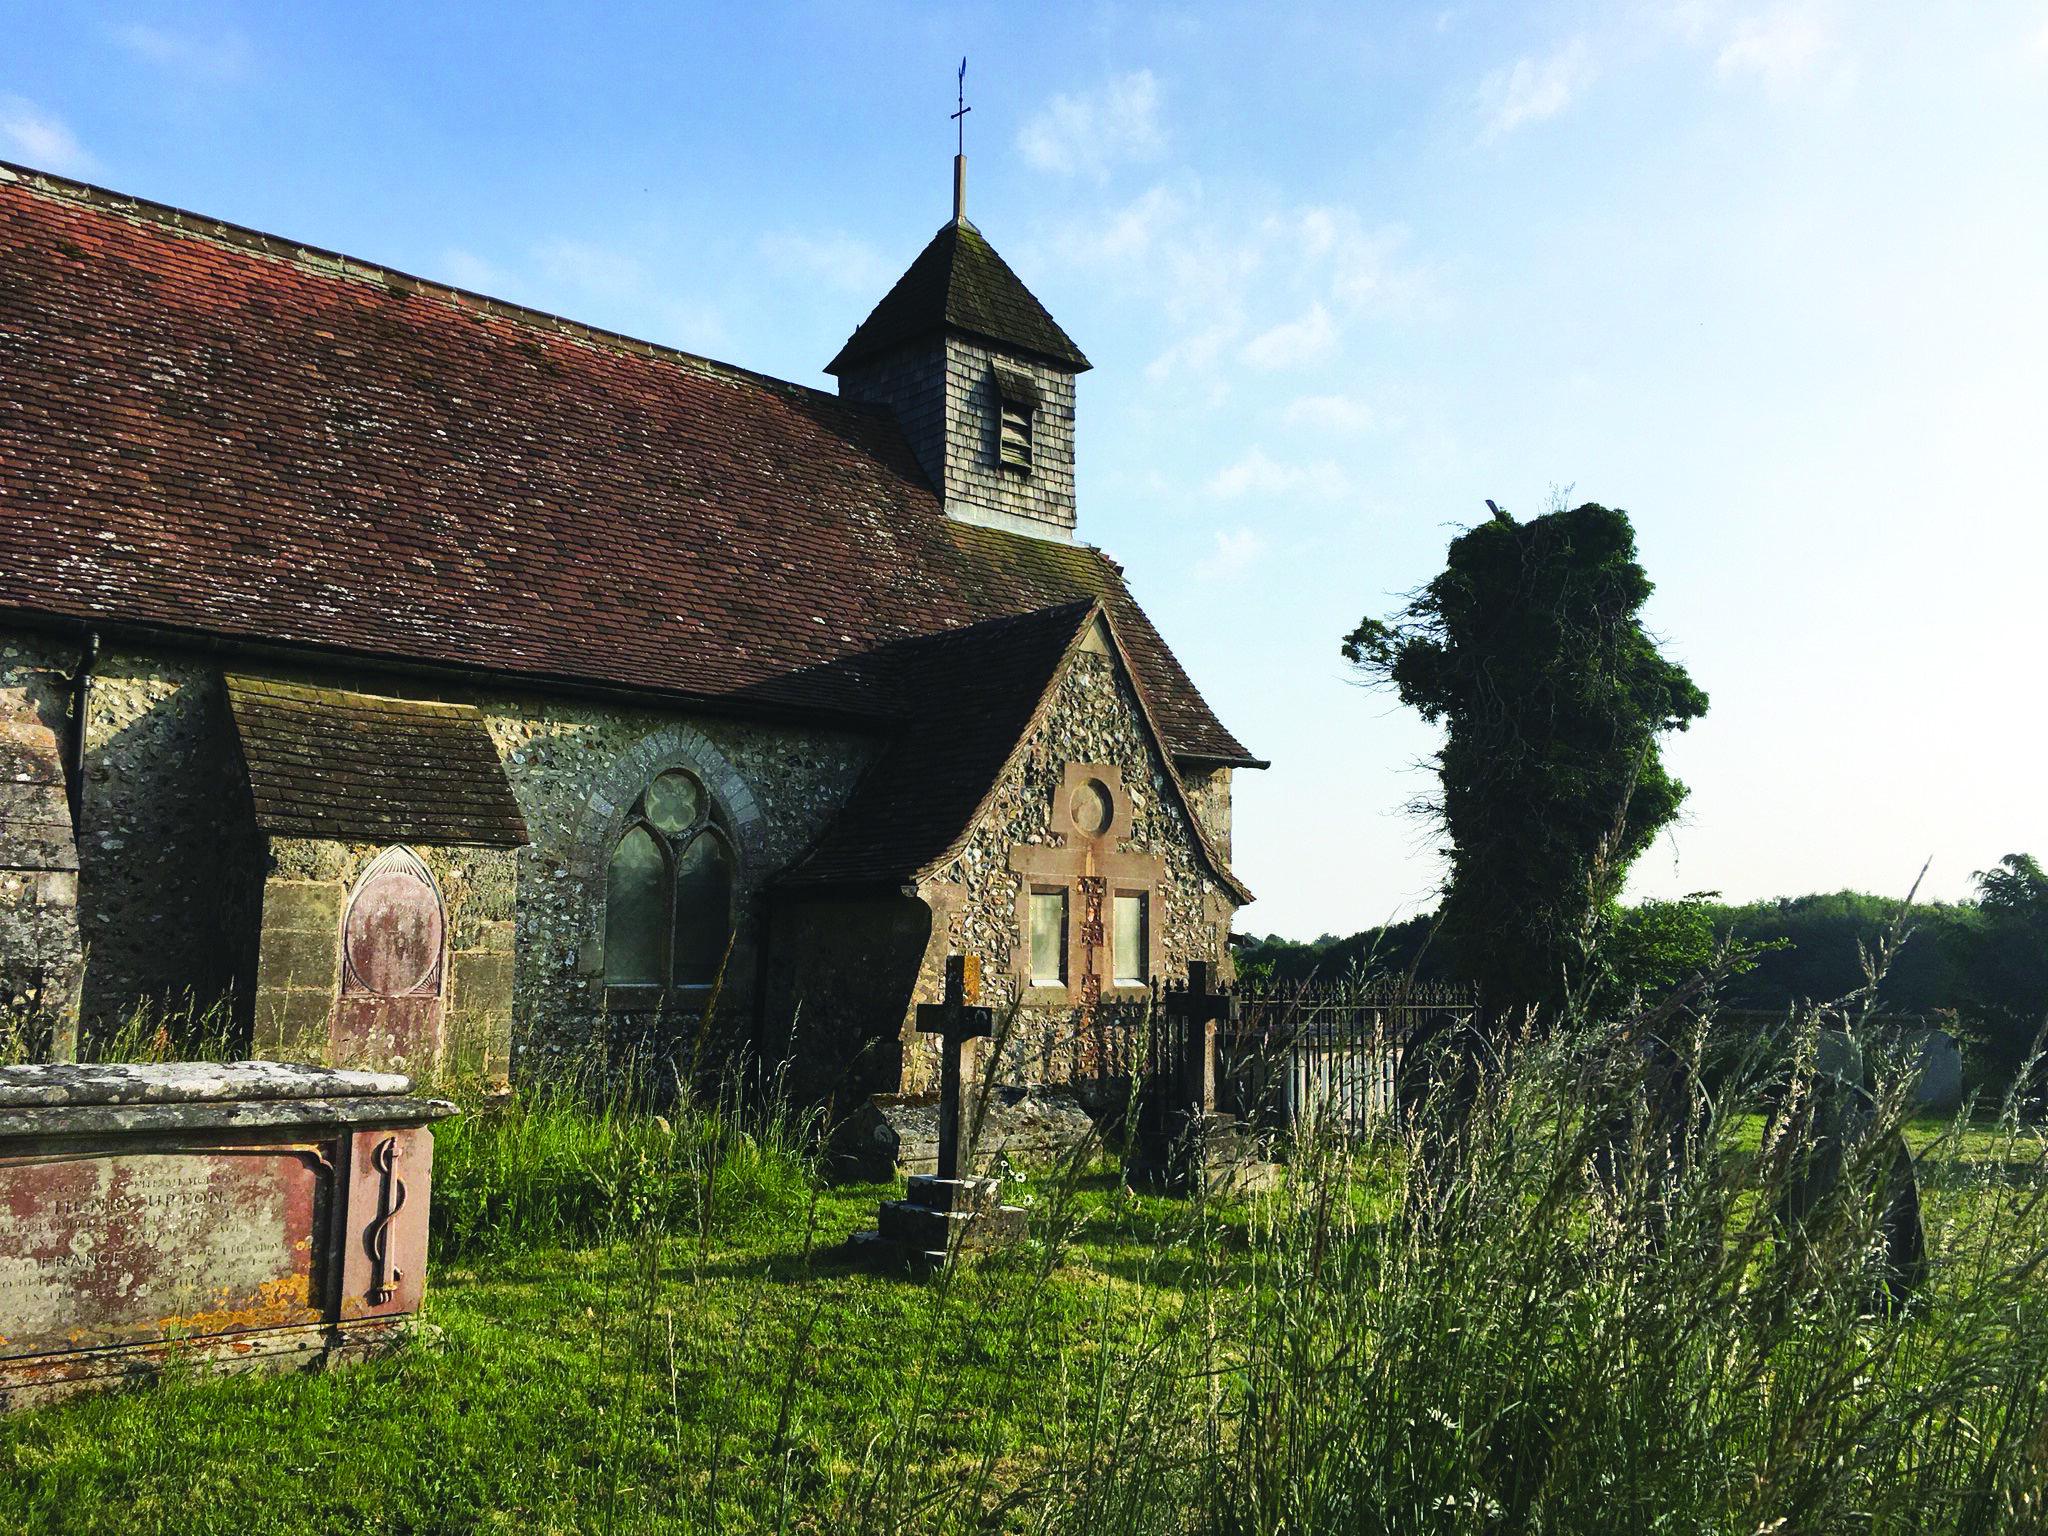 St Mary's Church, Binsted